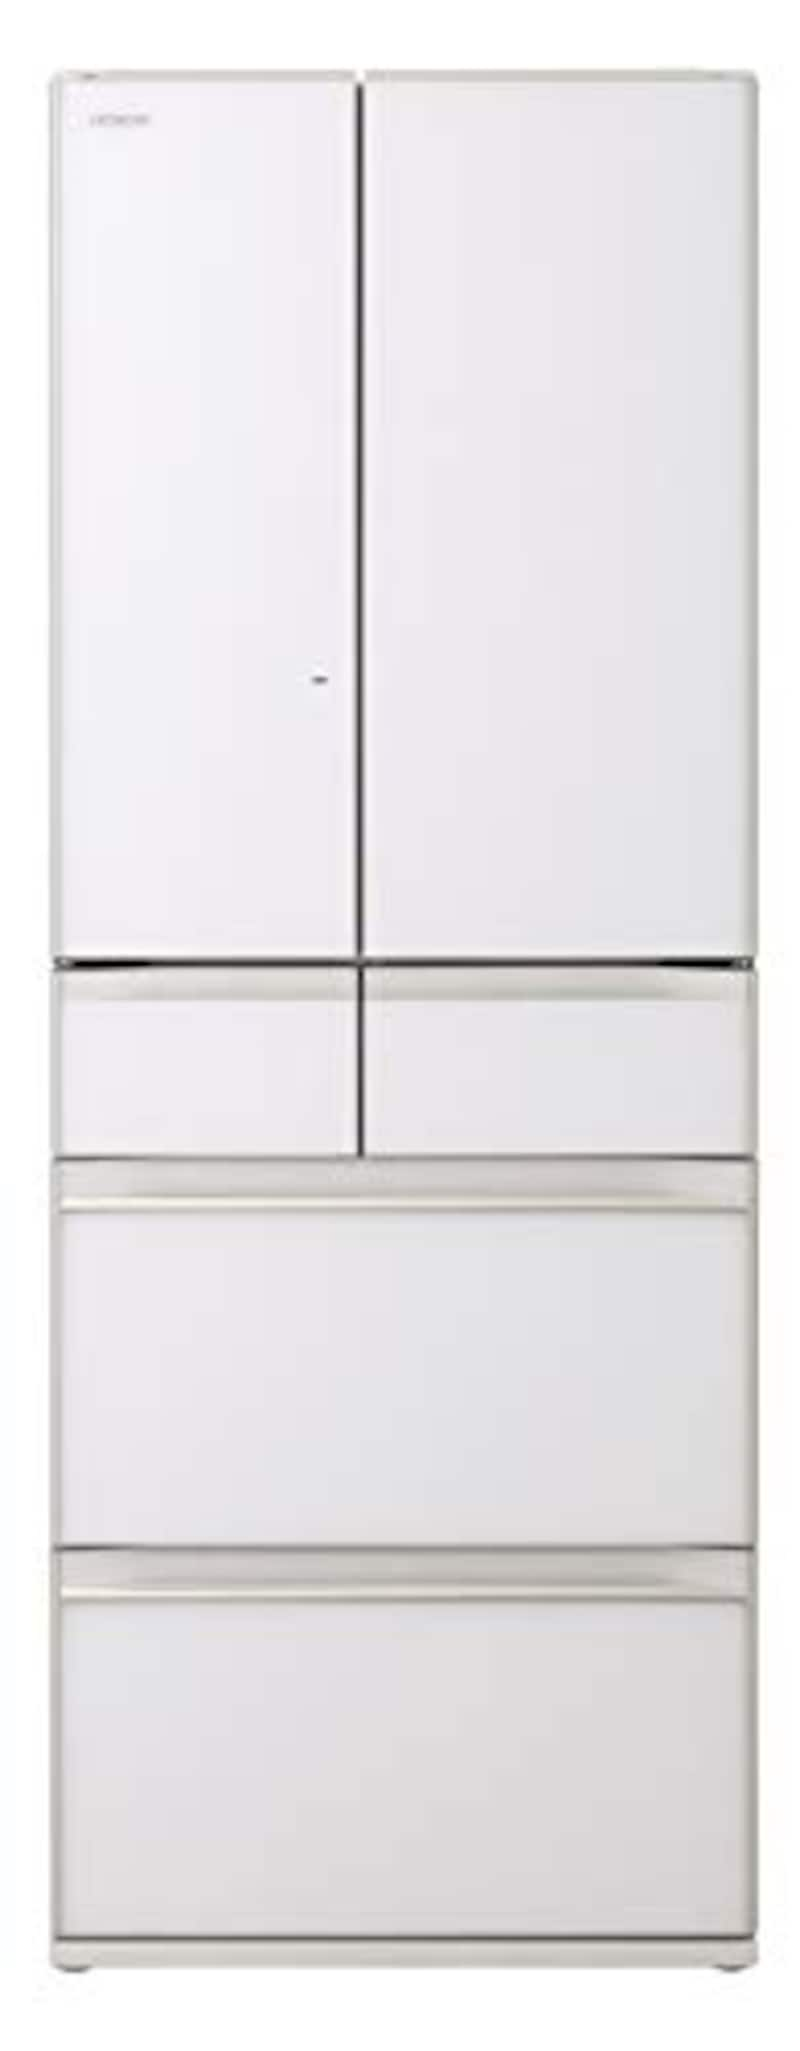 HITACHI(日立),大型冷蔵庫 まるごとチルド,R-HW60R